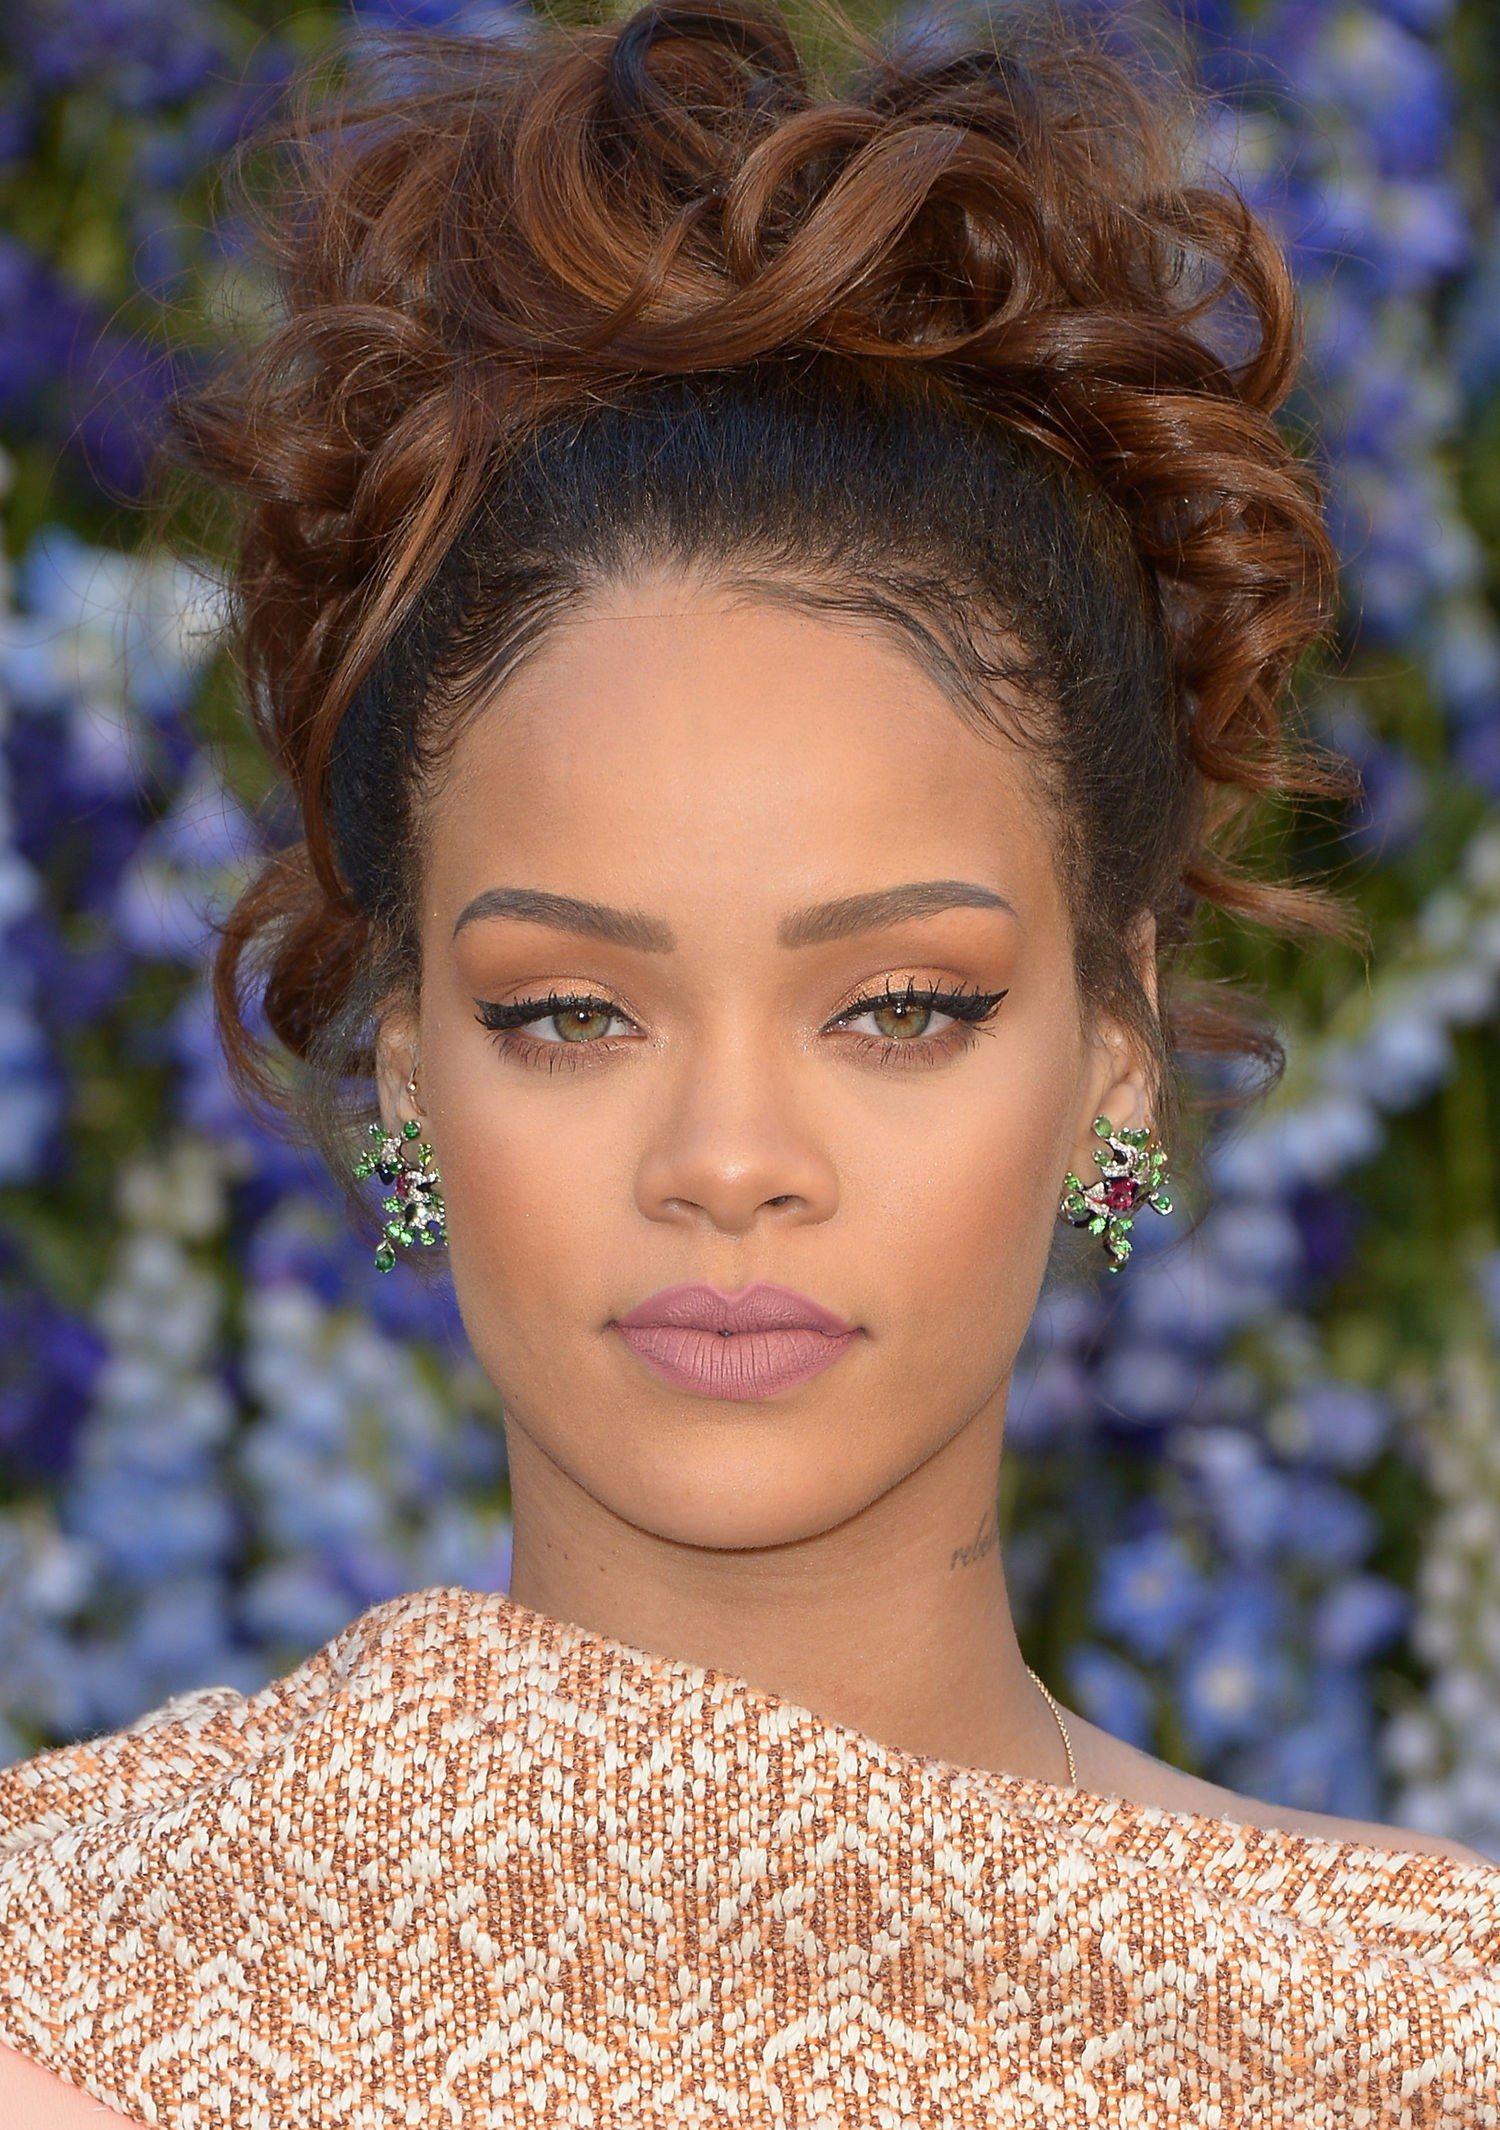 The 30 Best Celebrity Makeup Looks of 2015 Celebrity